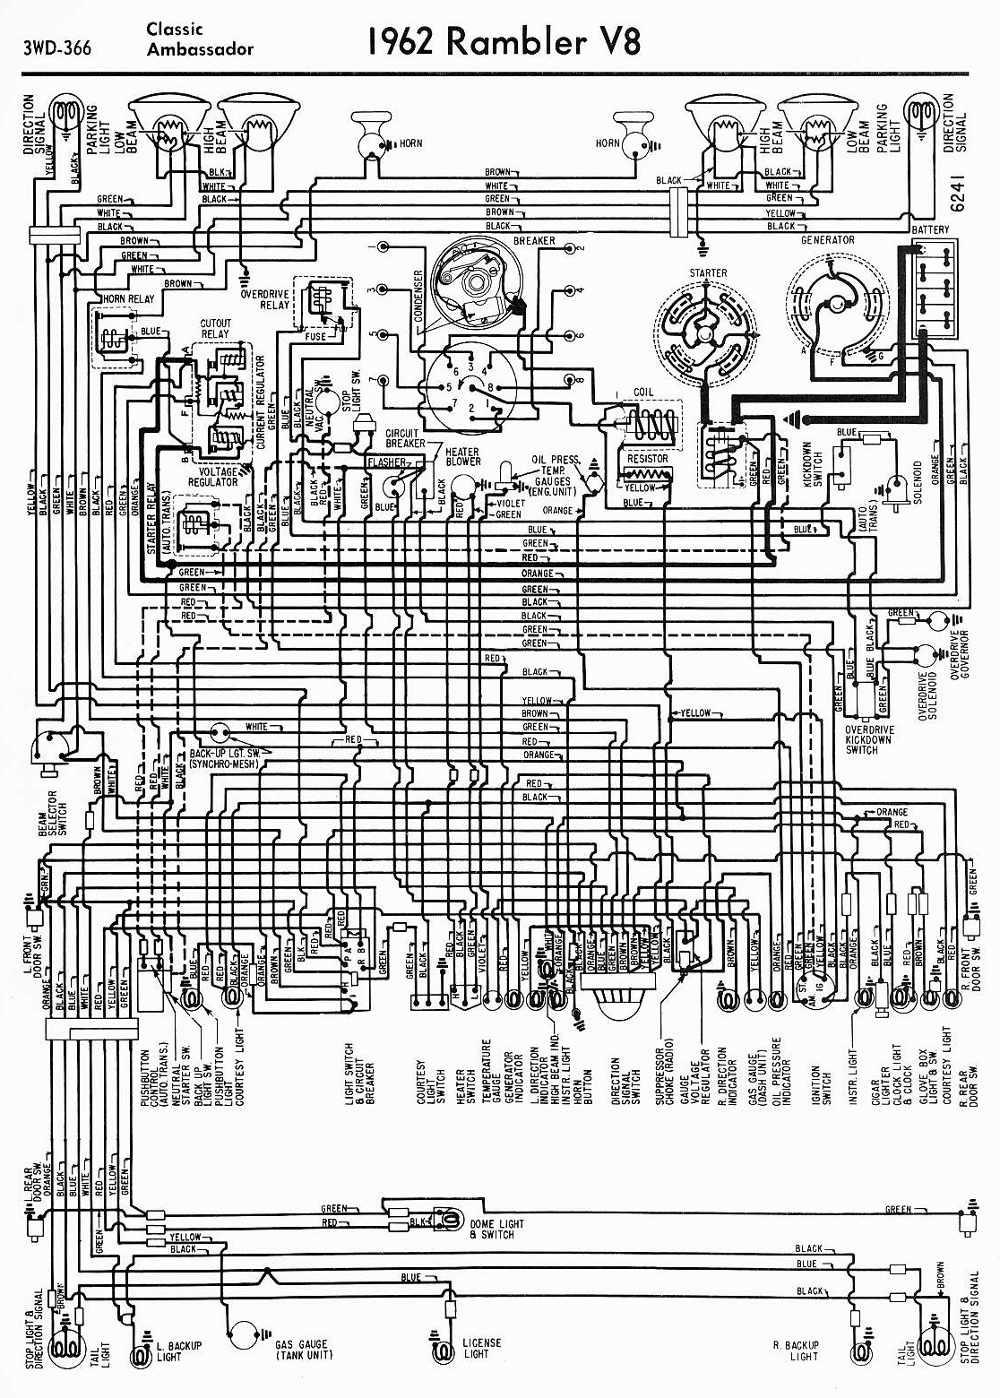 1962 Bonneville Wiring Diagram Electrical Diagrams 1956 Pontiac Trusted U2022 1969